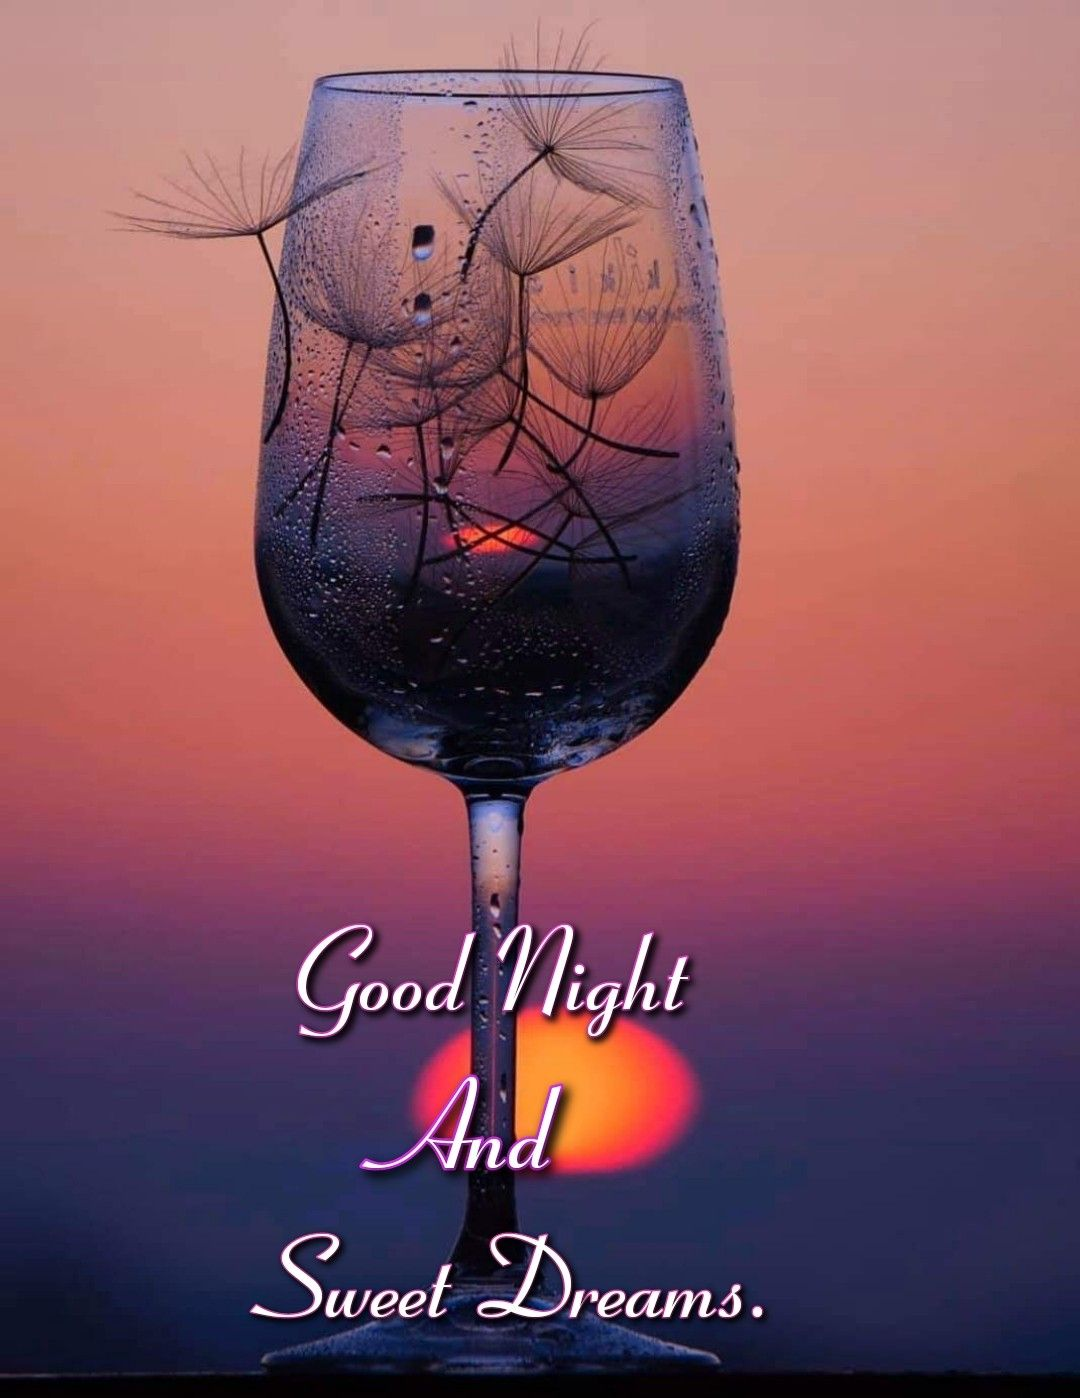 Pin By Giancarlo Siboni On Beautiful Night In 2020 Good Morning Nature Good Night Greetings Good Night Image